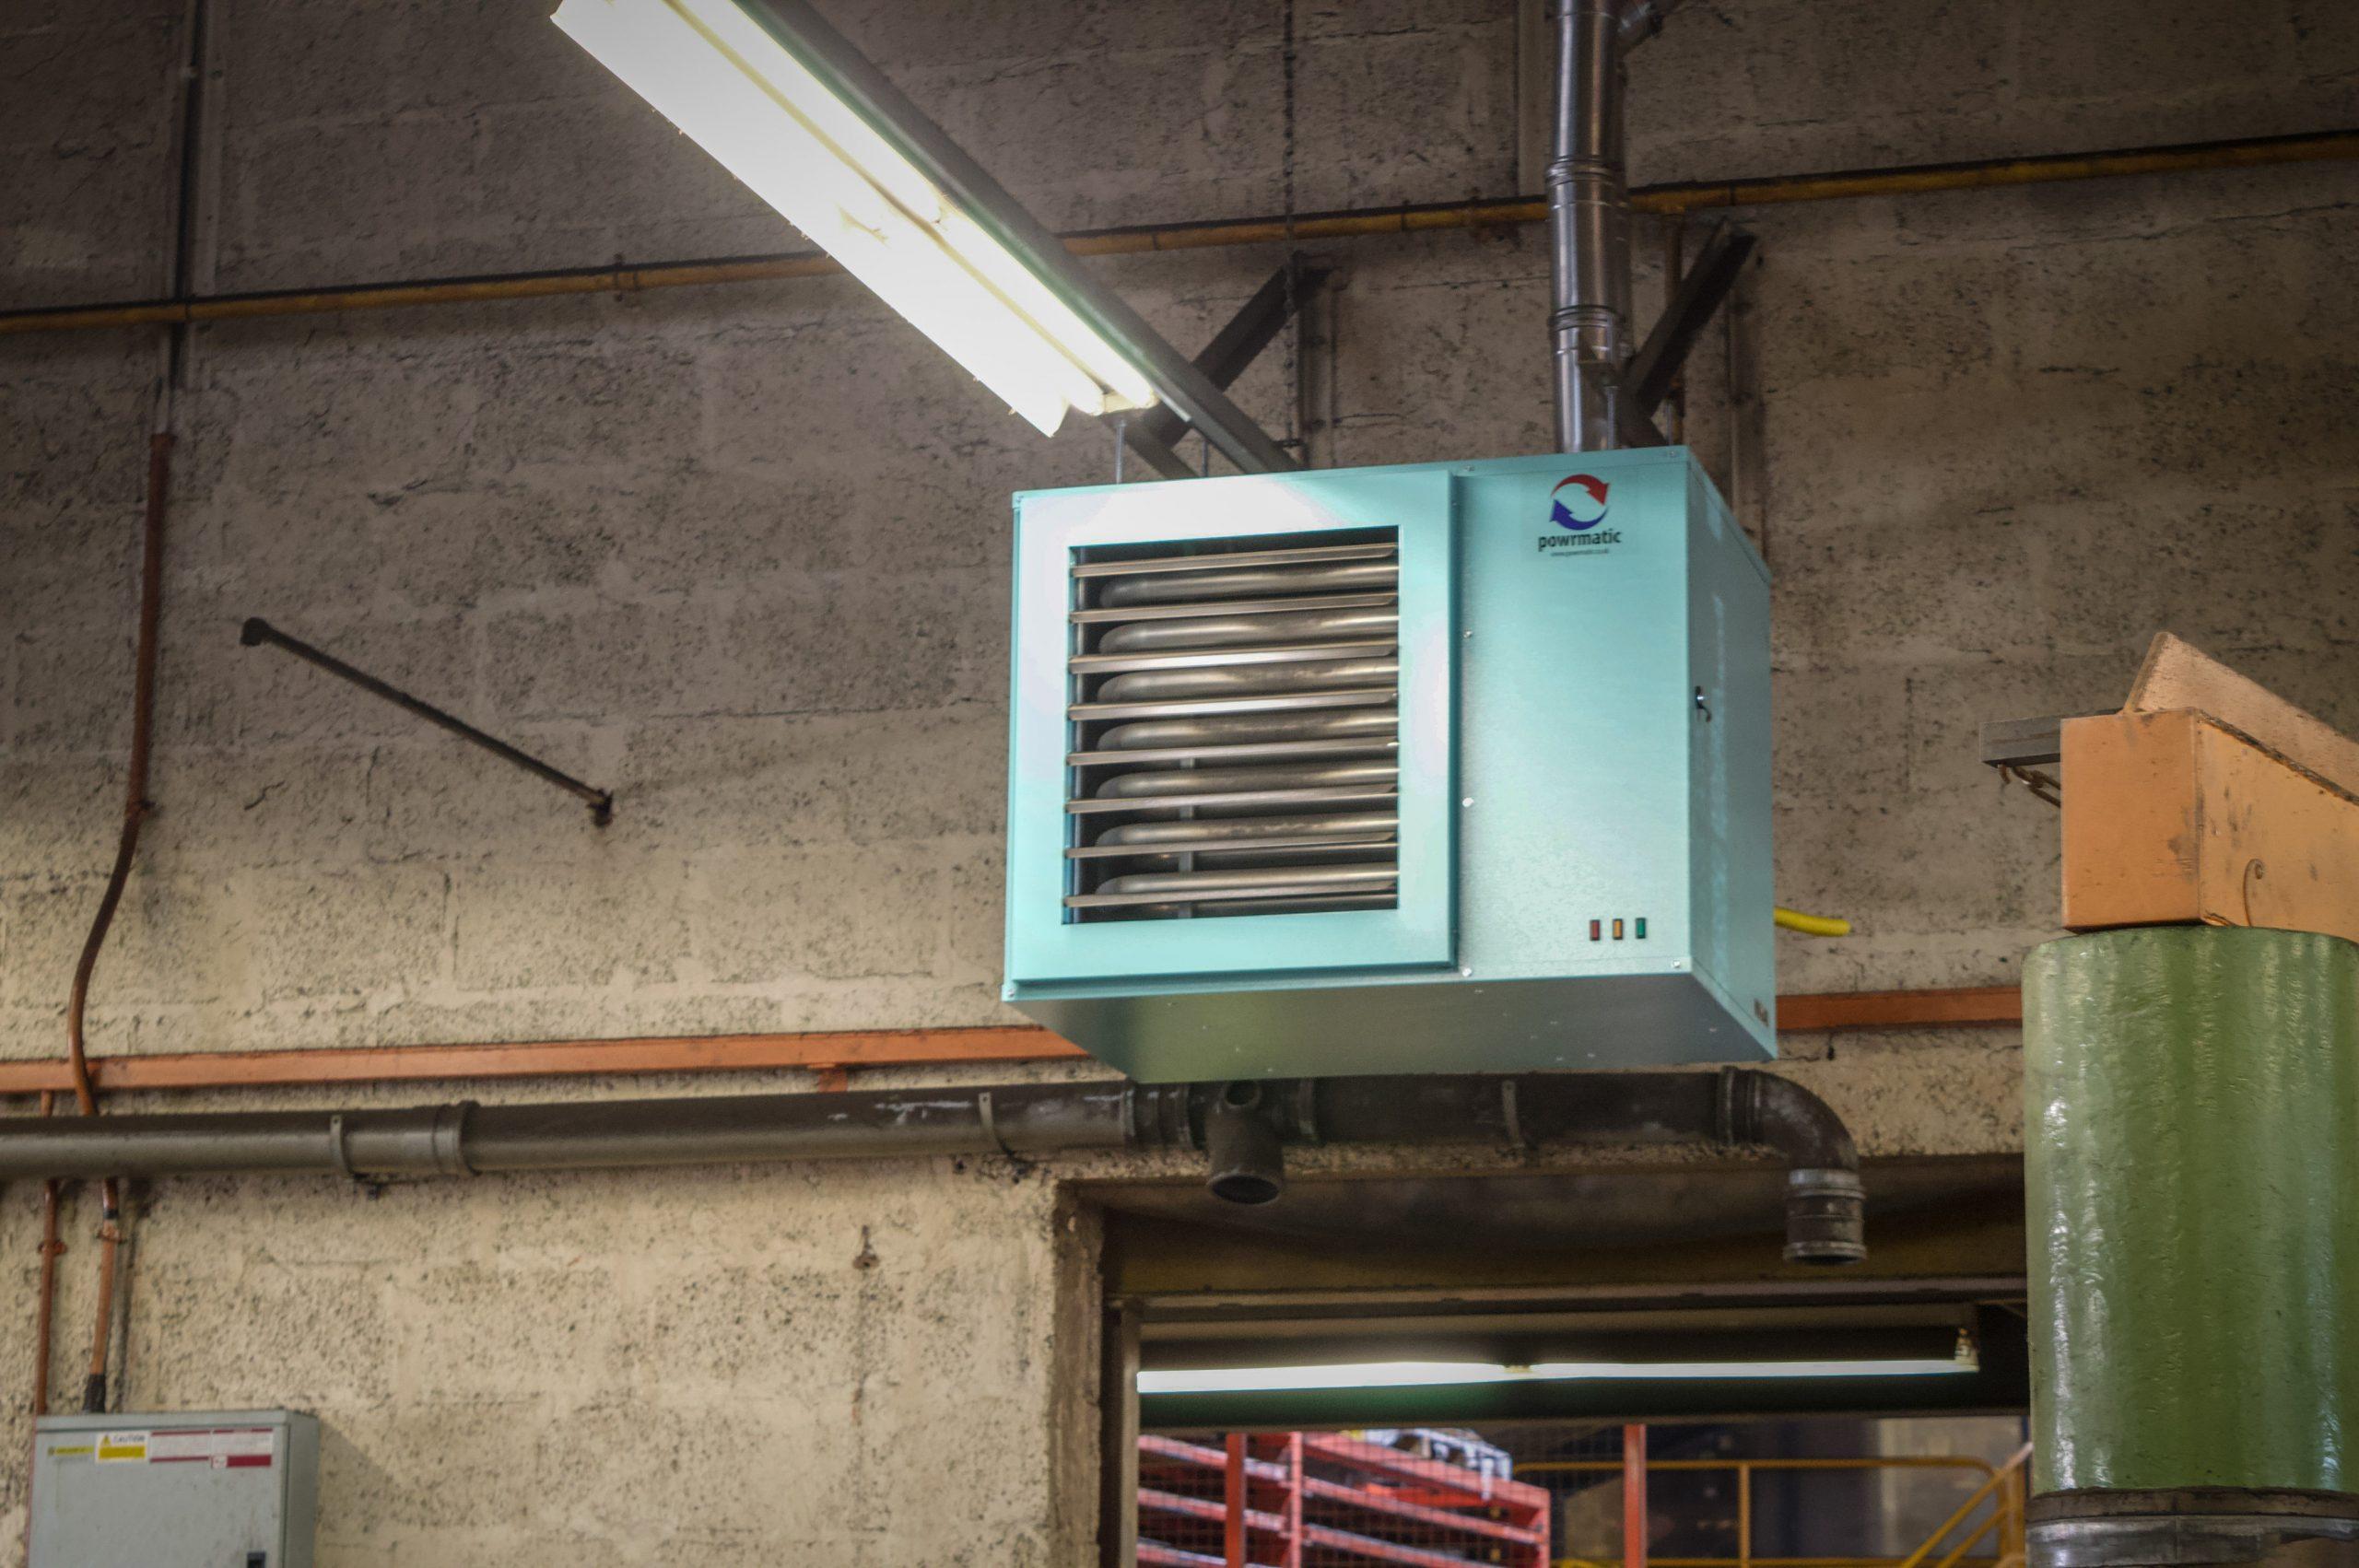 destratification fans to heat the warehouse workshop